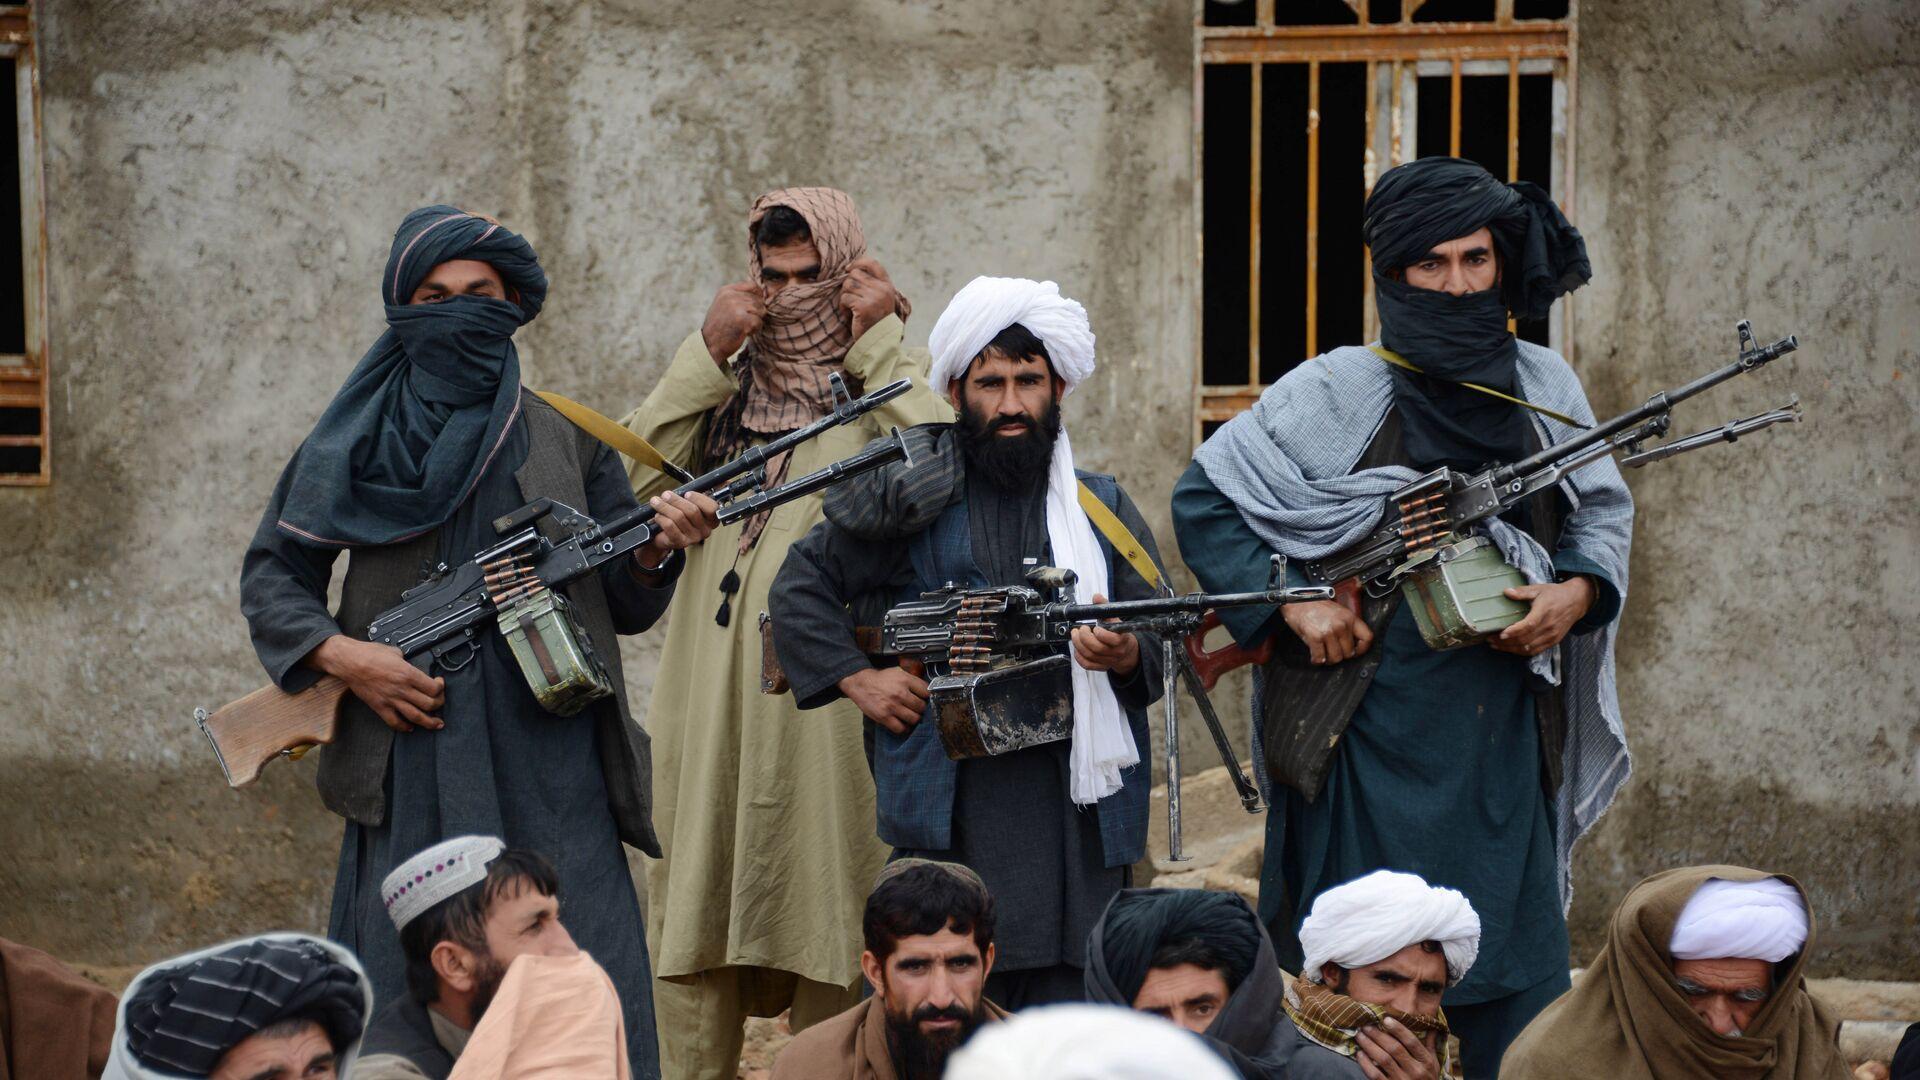 Talibanes afganos (archivo) - Sputnik Mundo, 1920, 22.03.2021